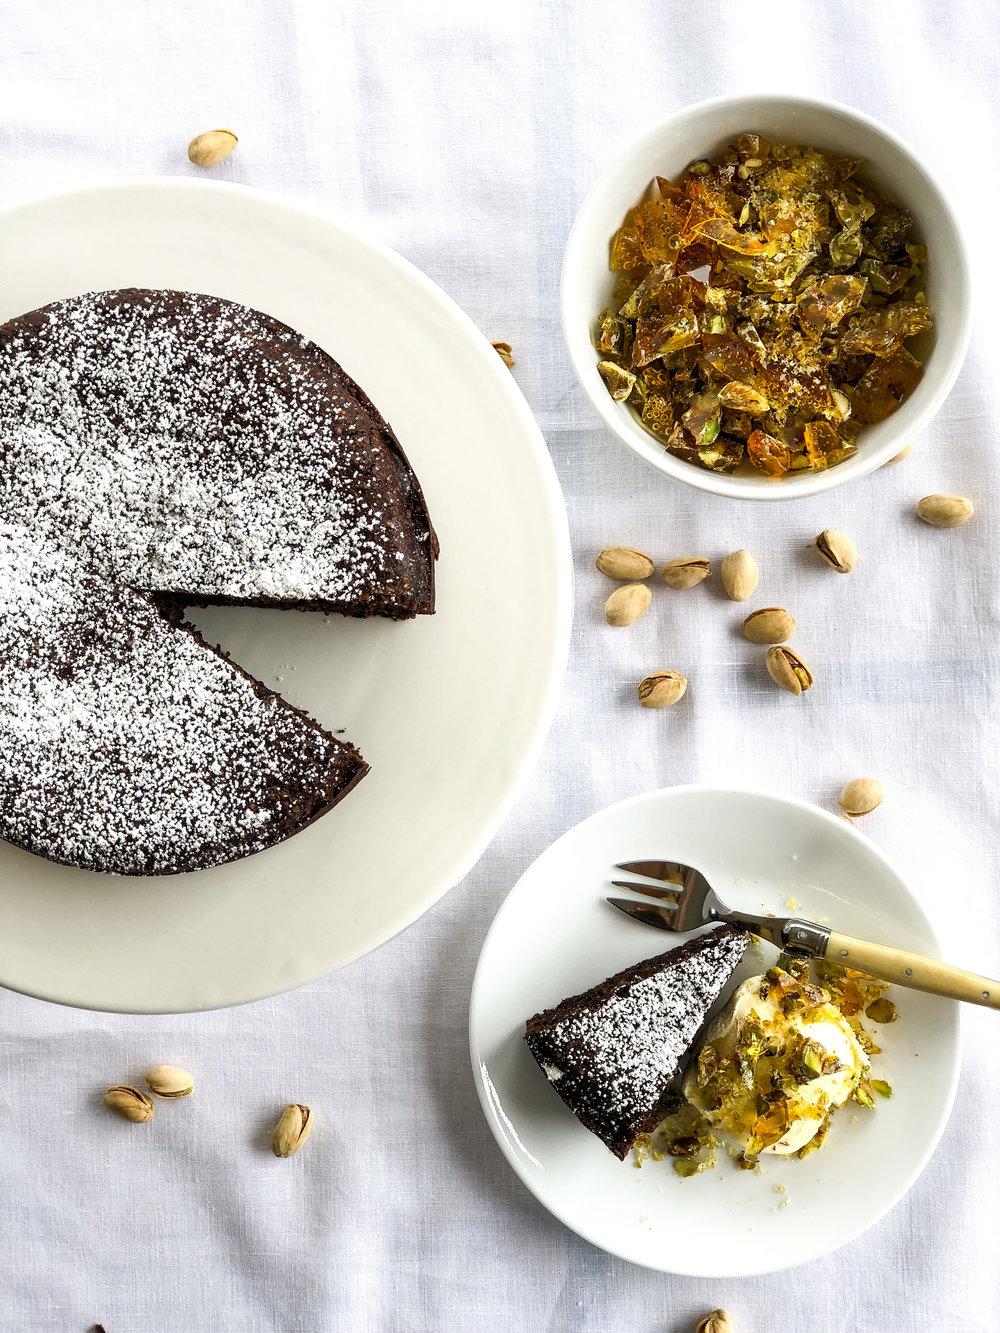 Chocolate Olive Oil Cake.JPG